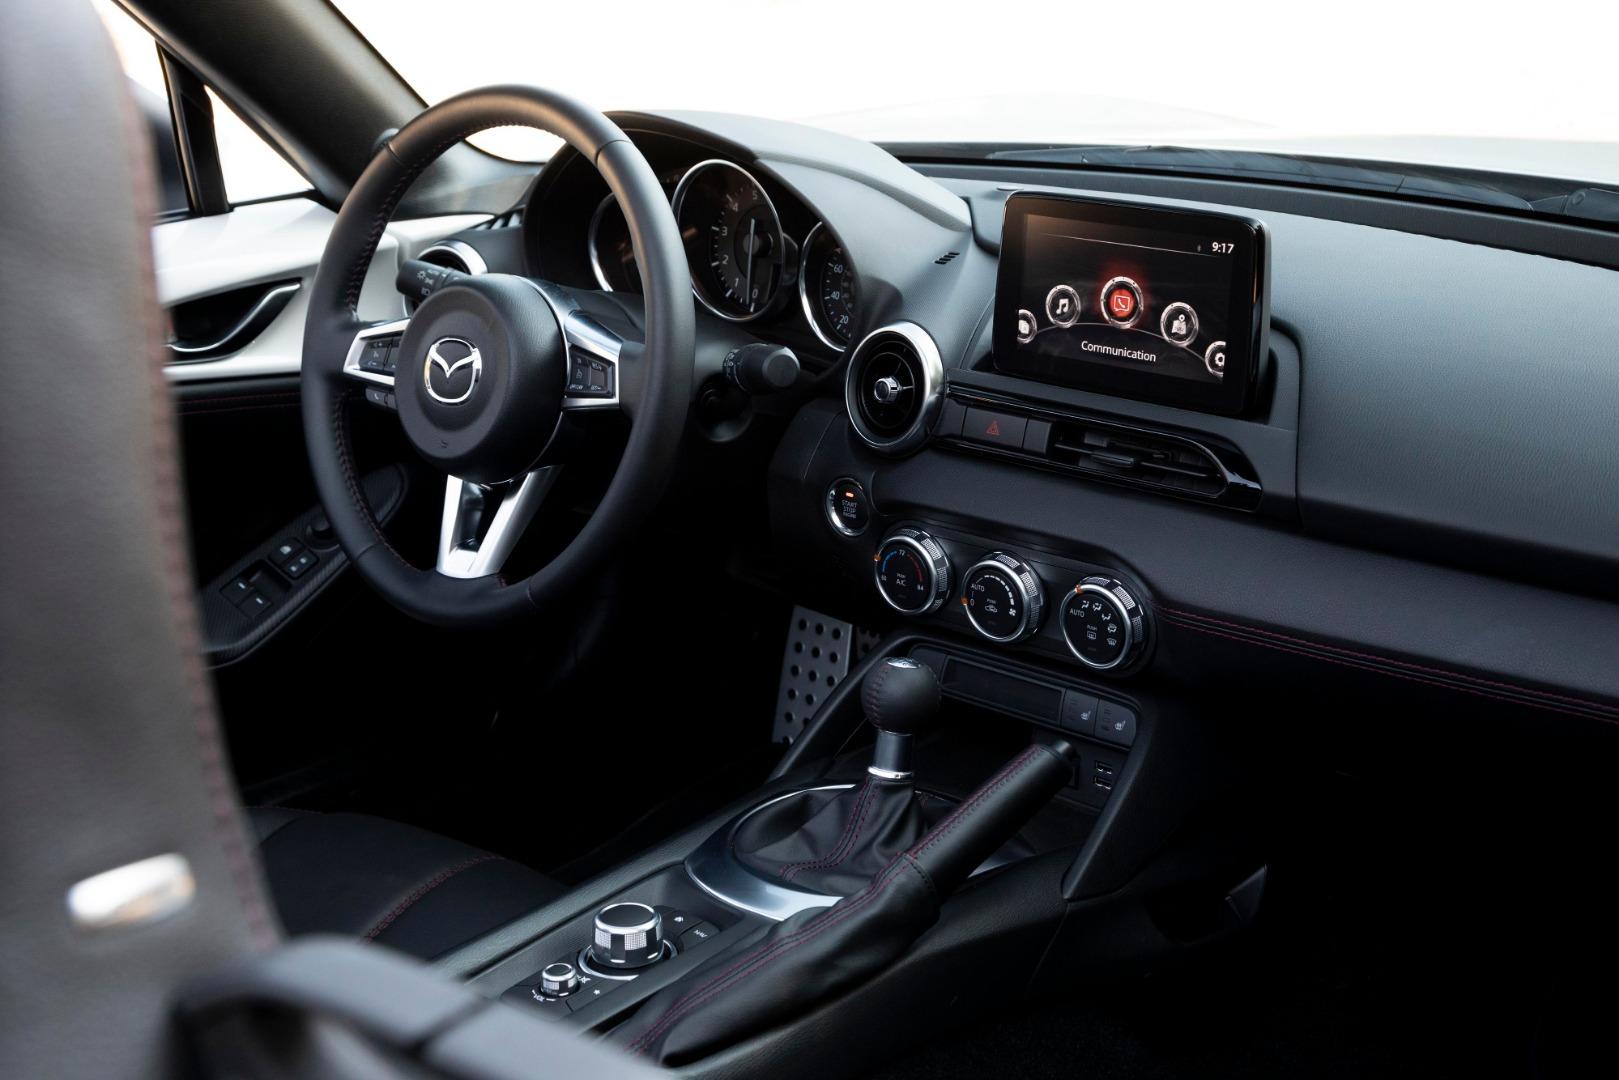 Other Car Parts Genuine Mazda MX-5 Gear Shift Knob W/O ...